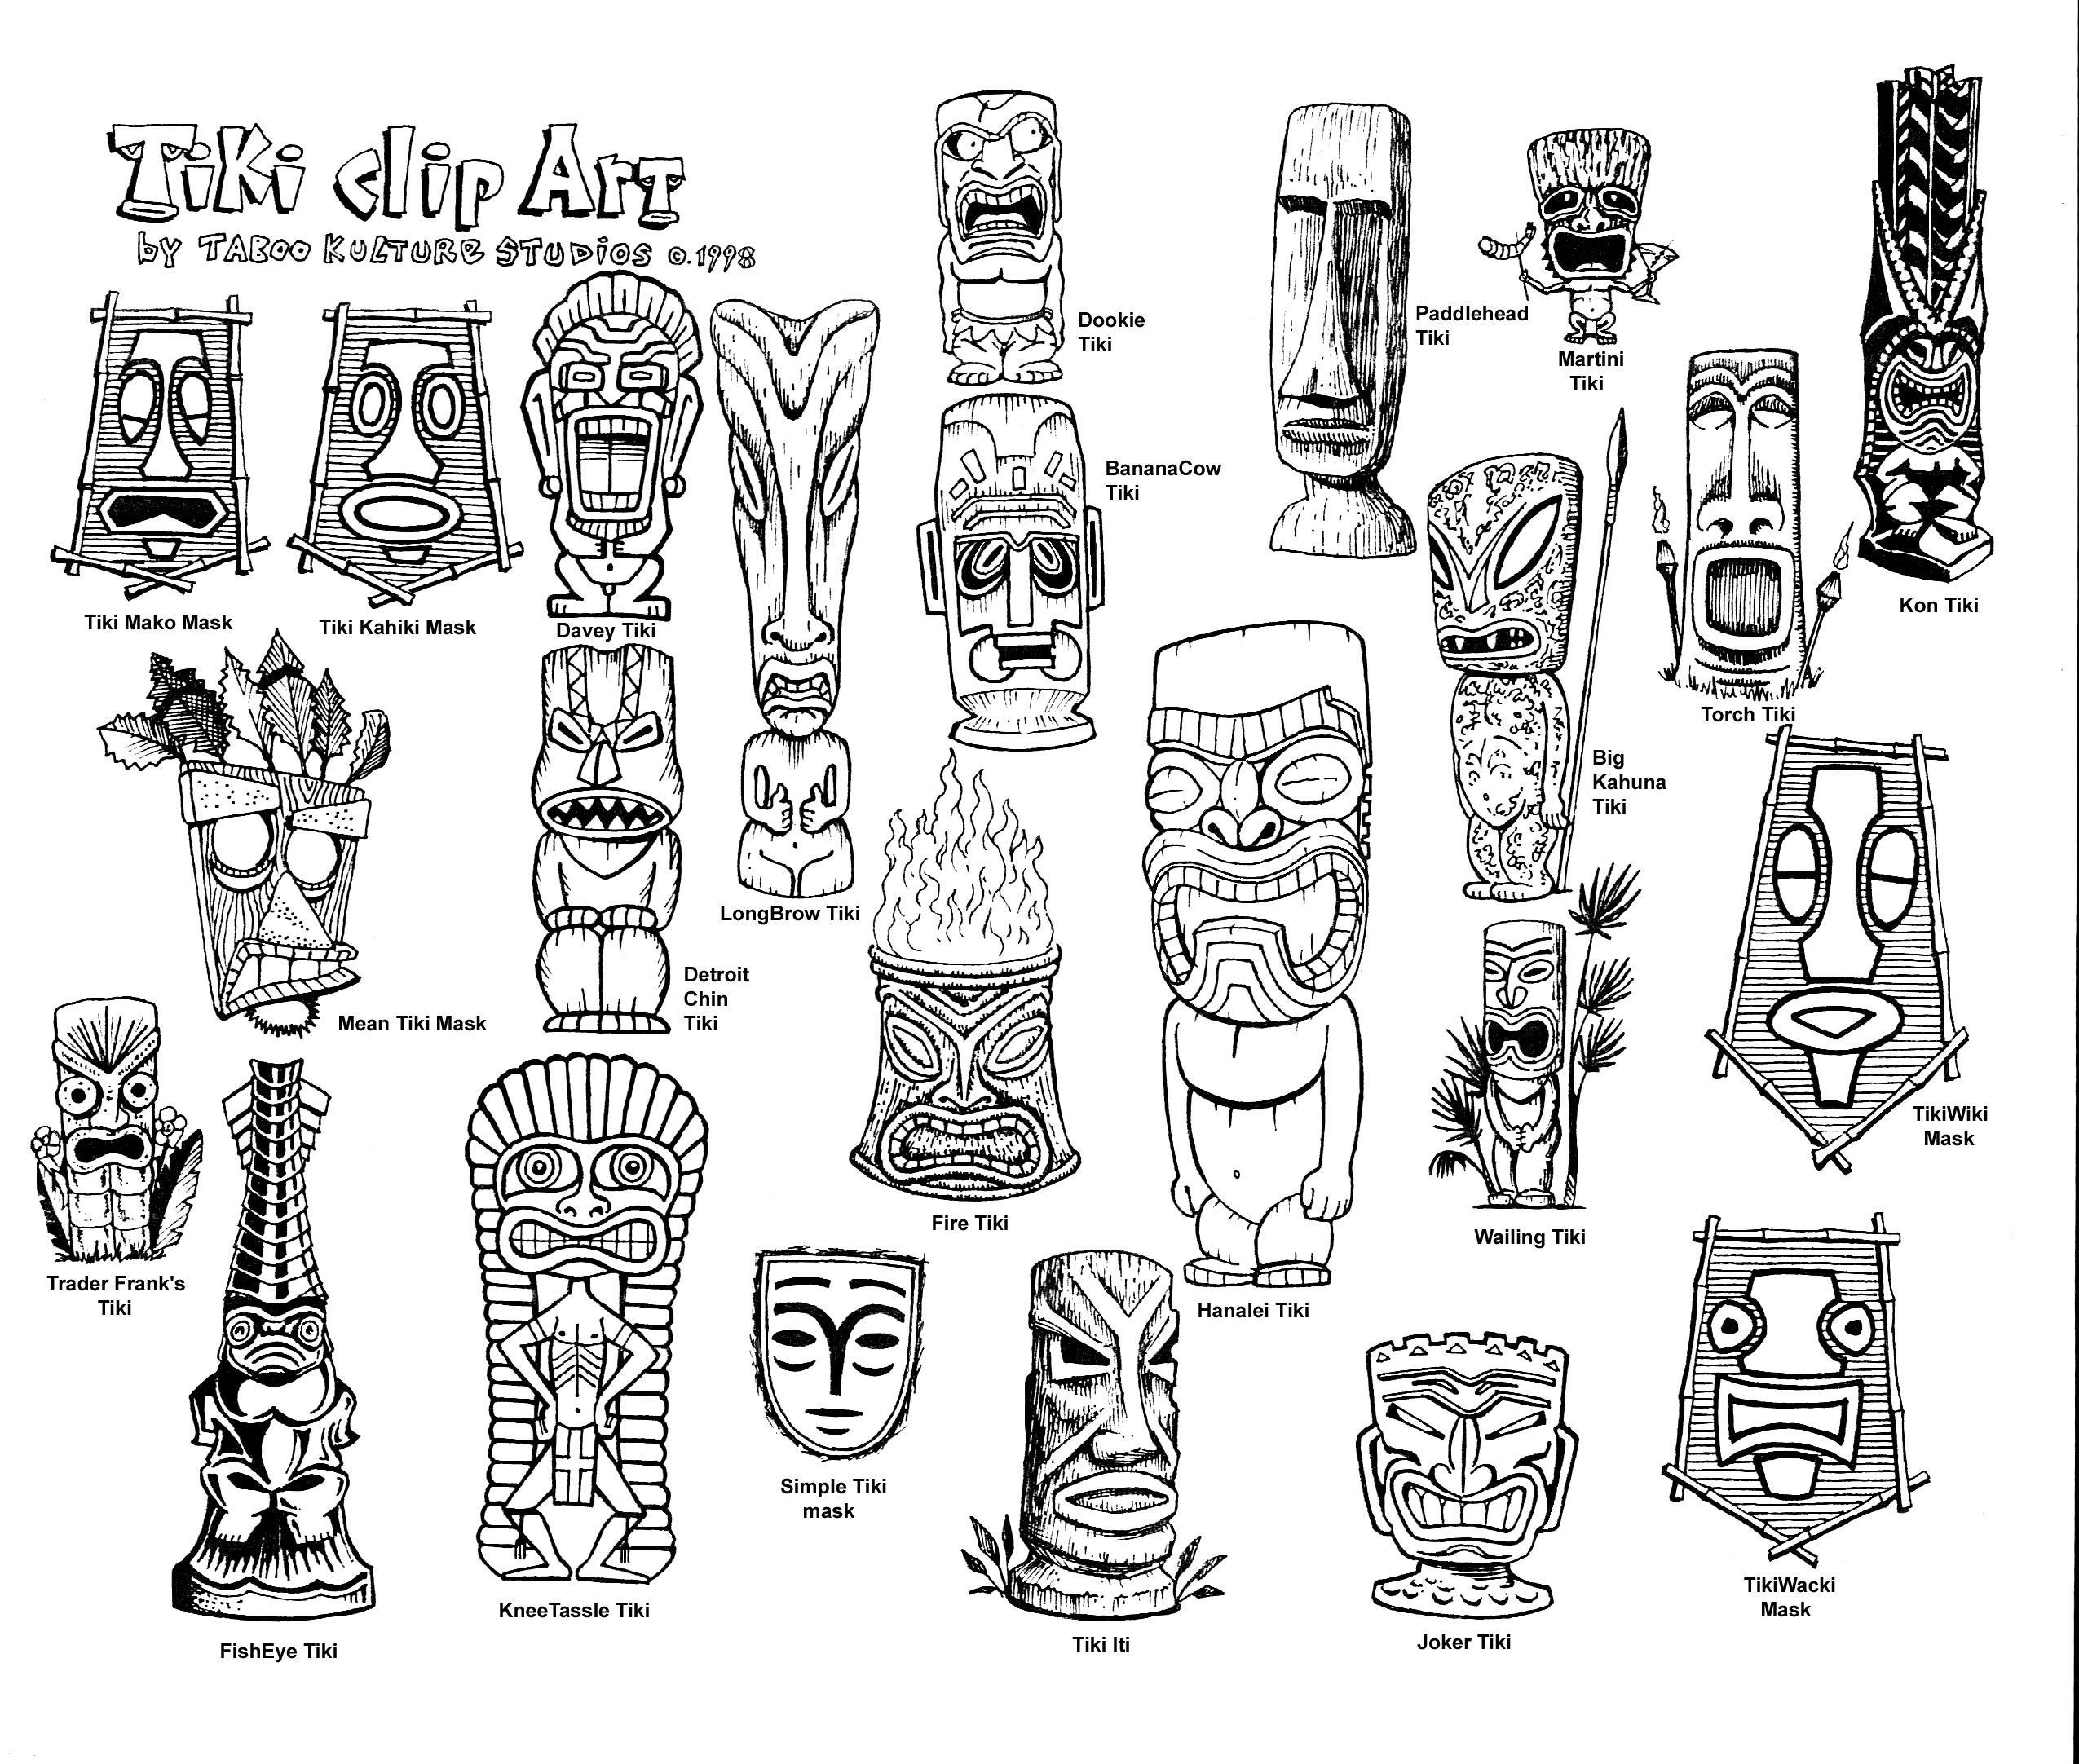 Tiki Hawaiian Mask Clip Art - Tiki Drawings - Free Transparent PNG Clipart  Images Download